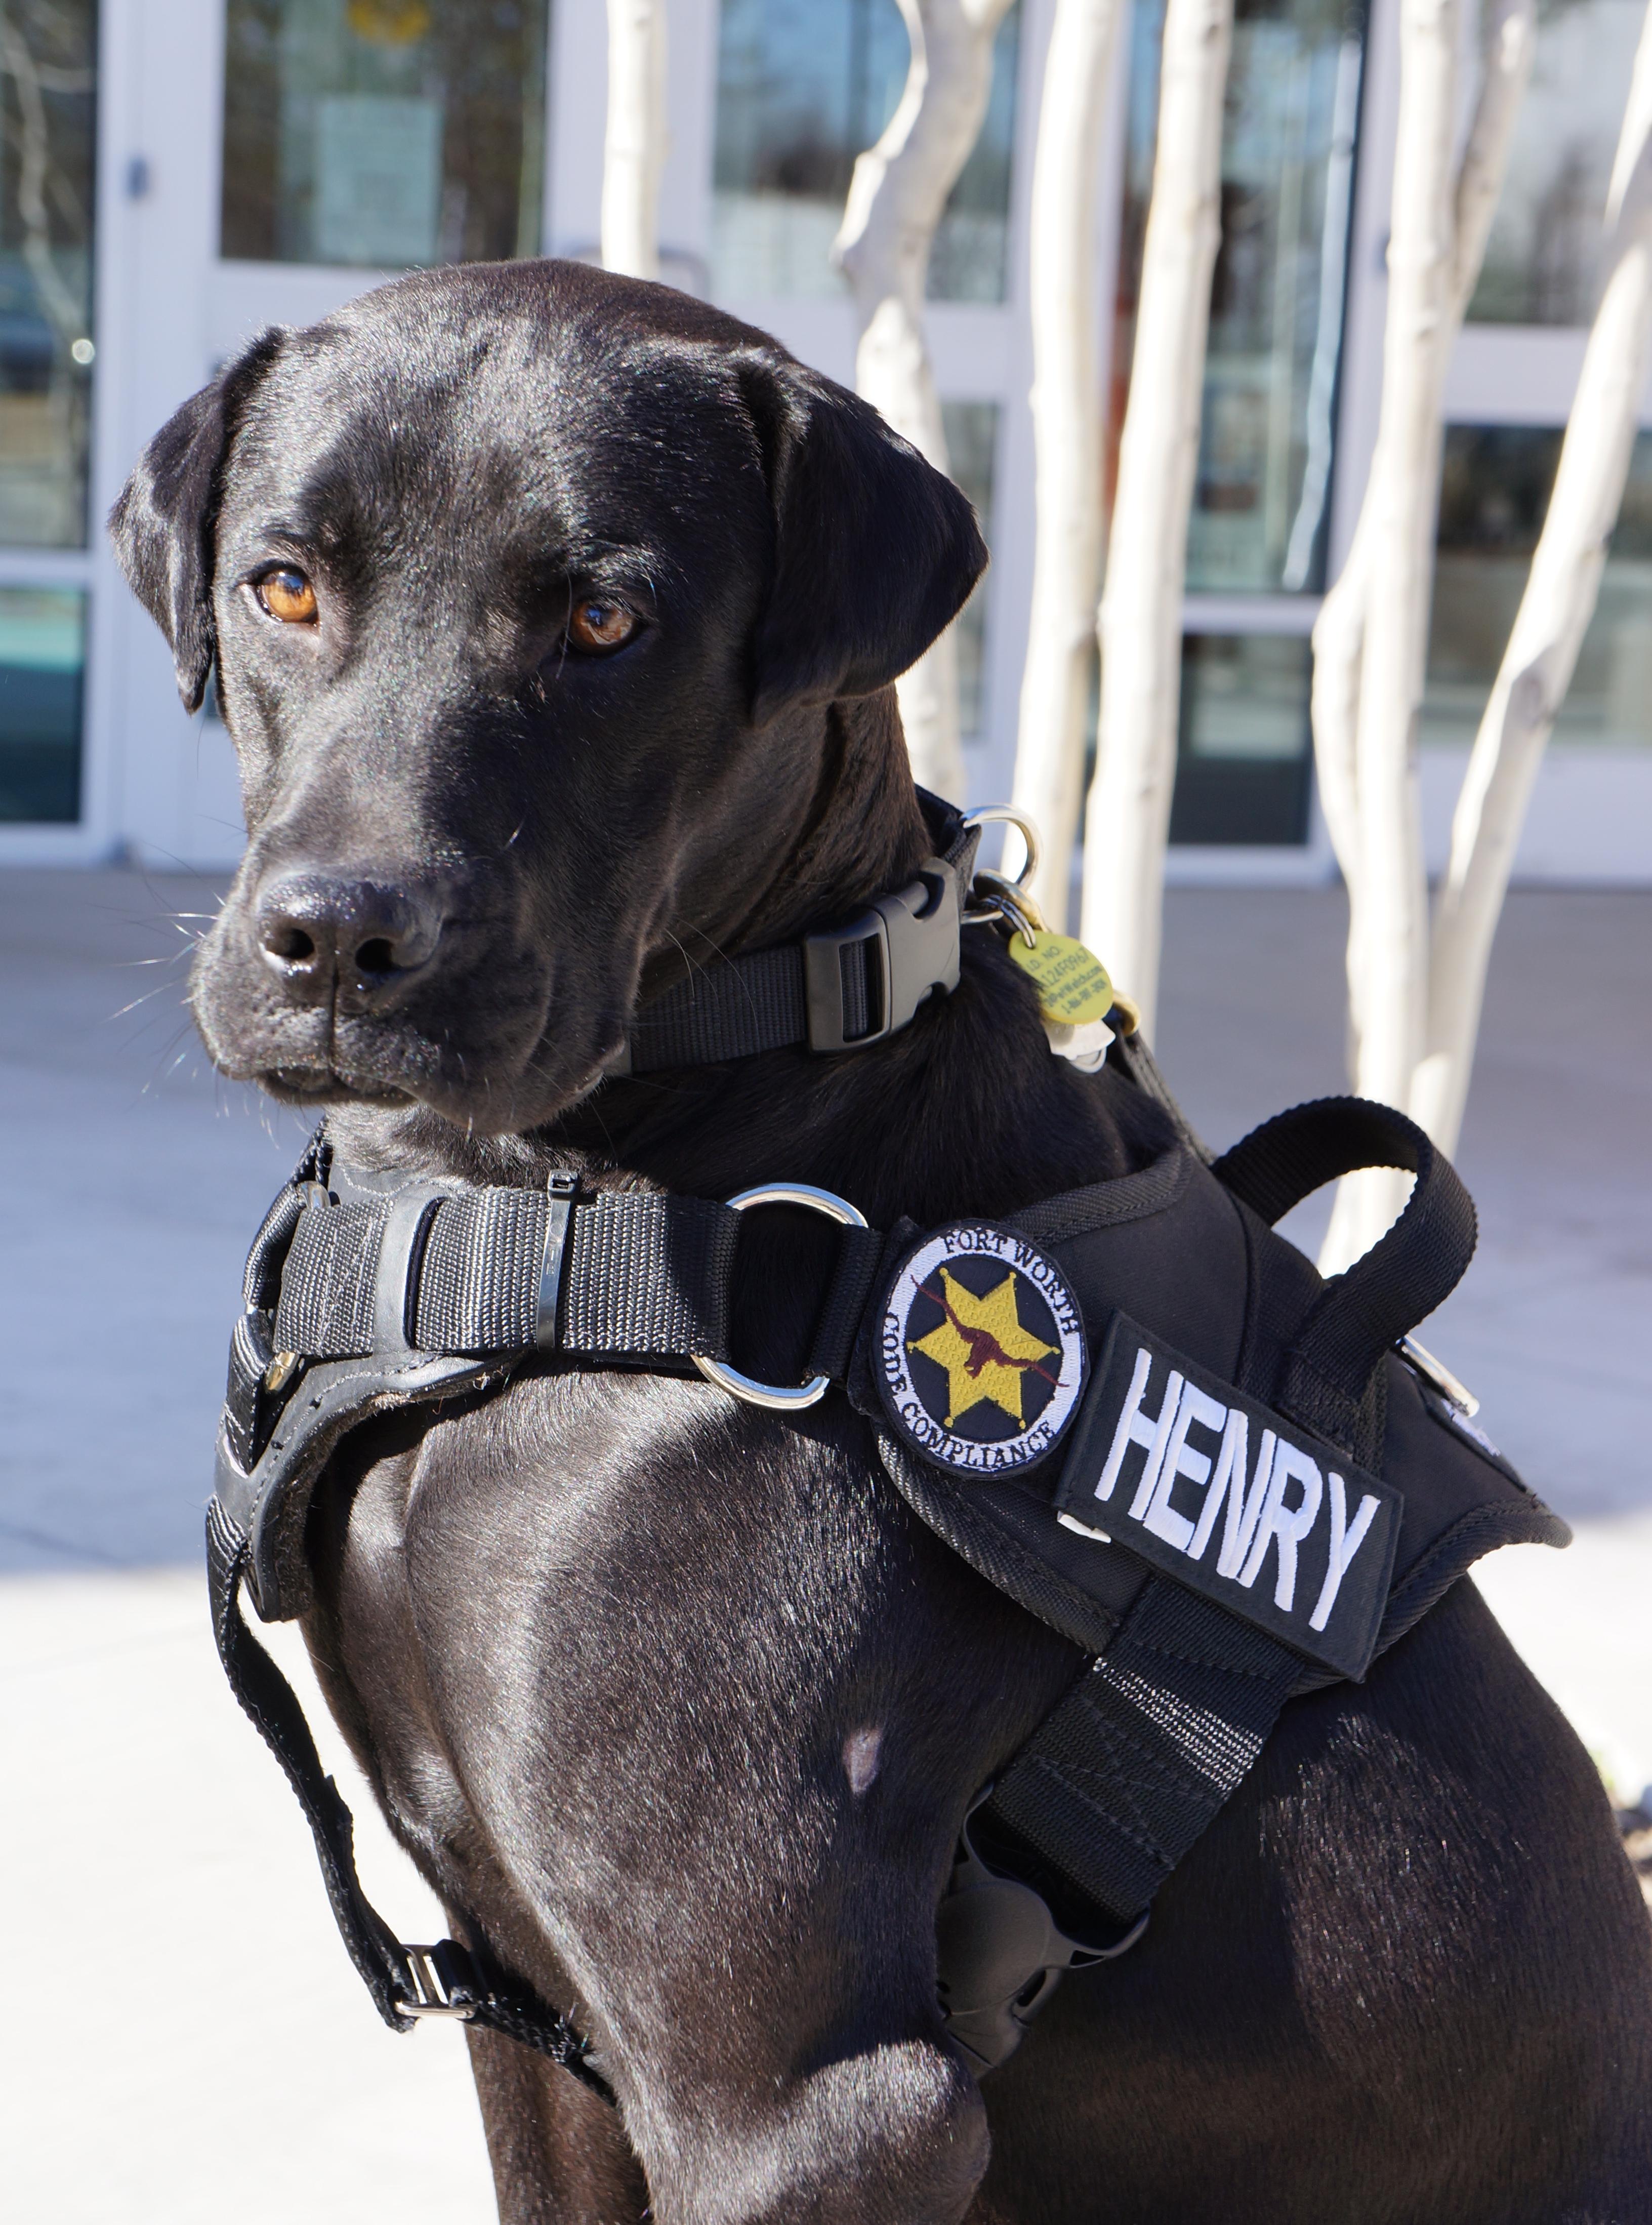 Henry the dog